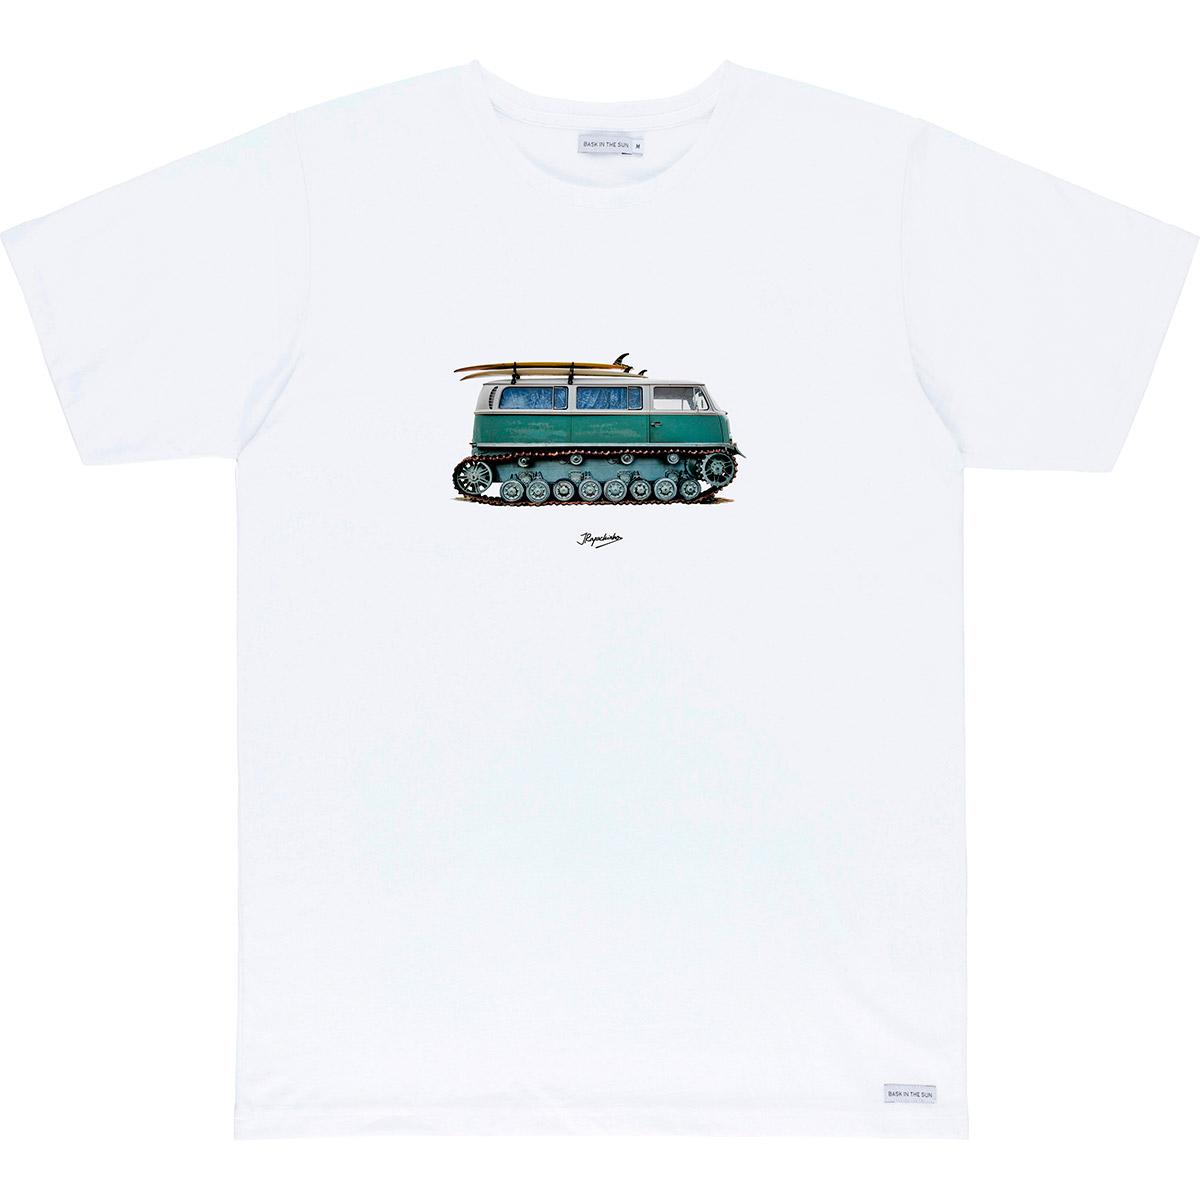 T-shirt en coton bio white tout terrain - Bask in the Sun num 0